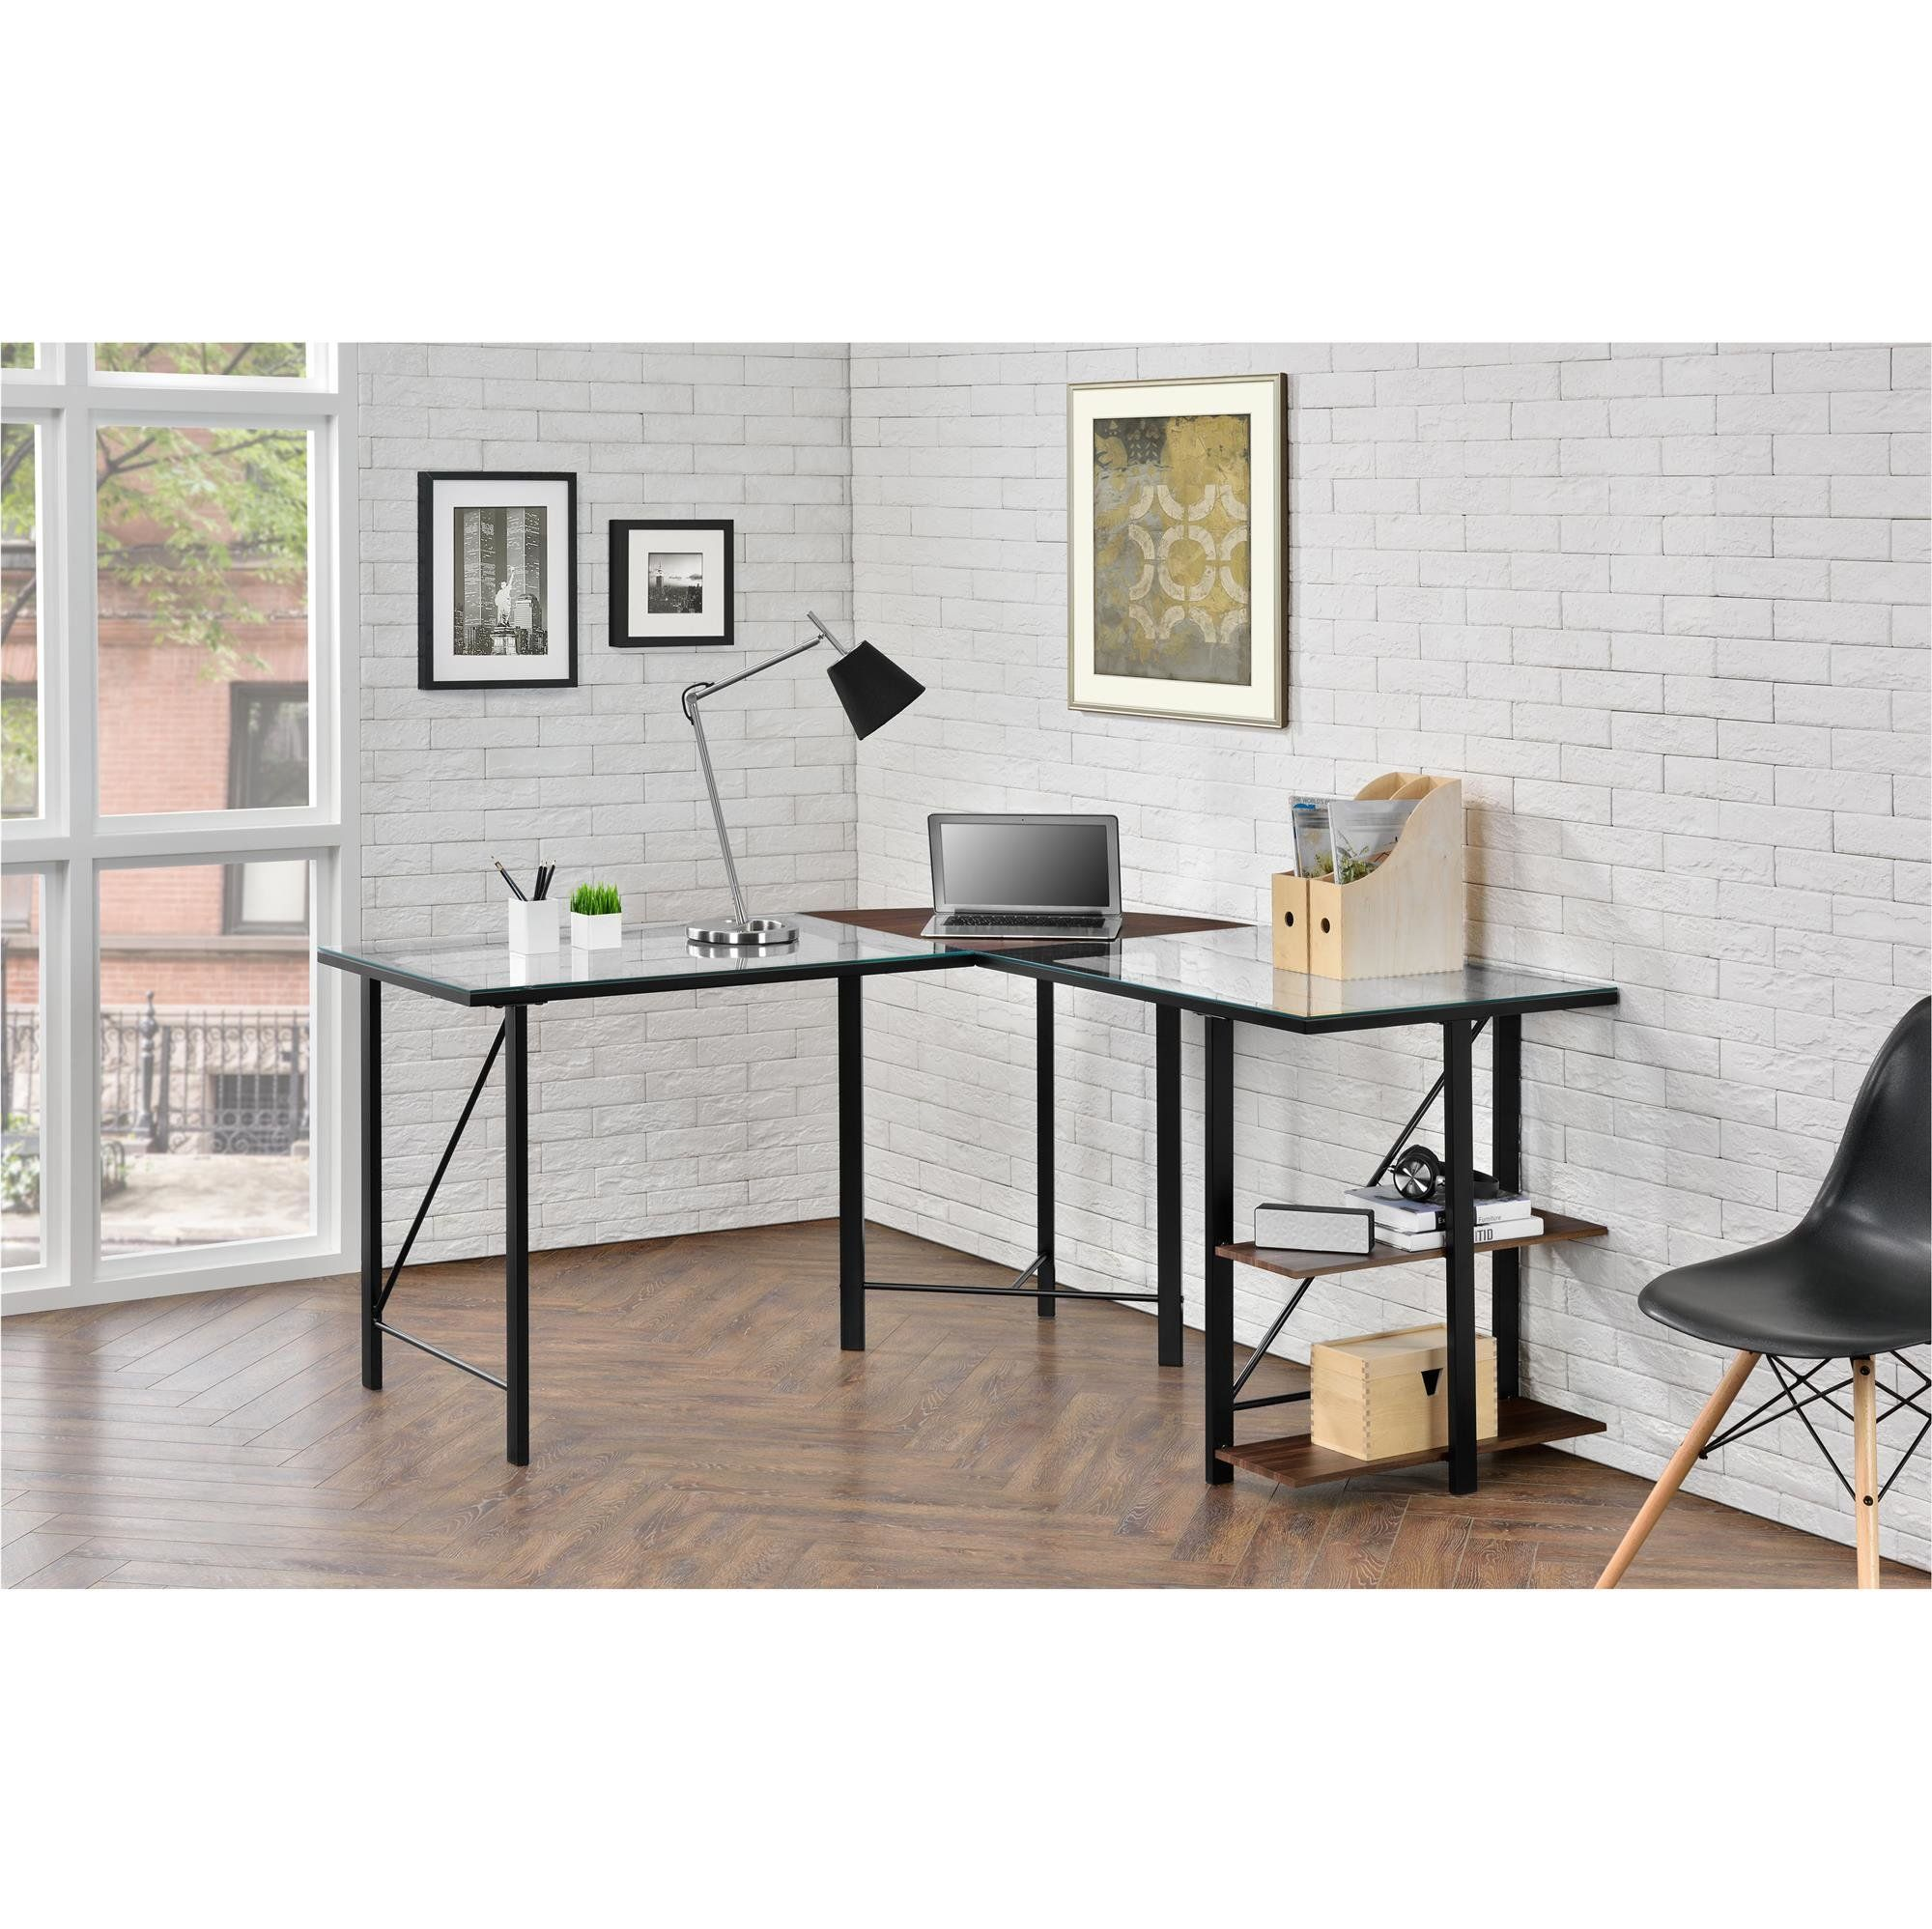 Pando lshape writing desk products pinterest writing desk and